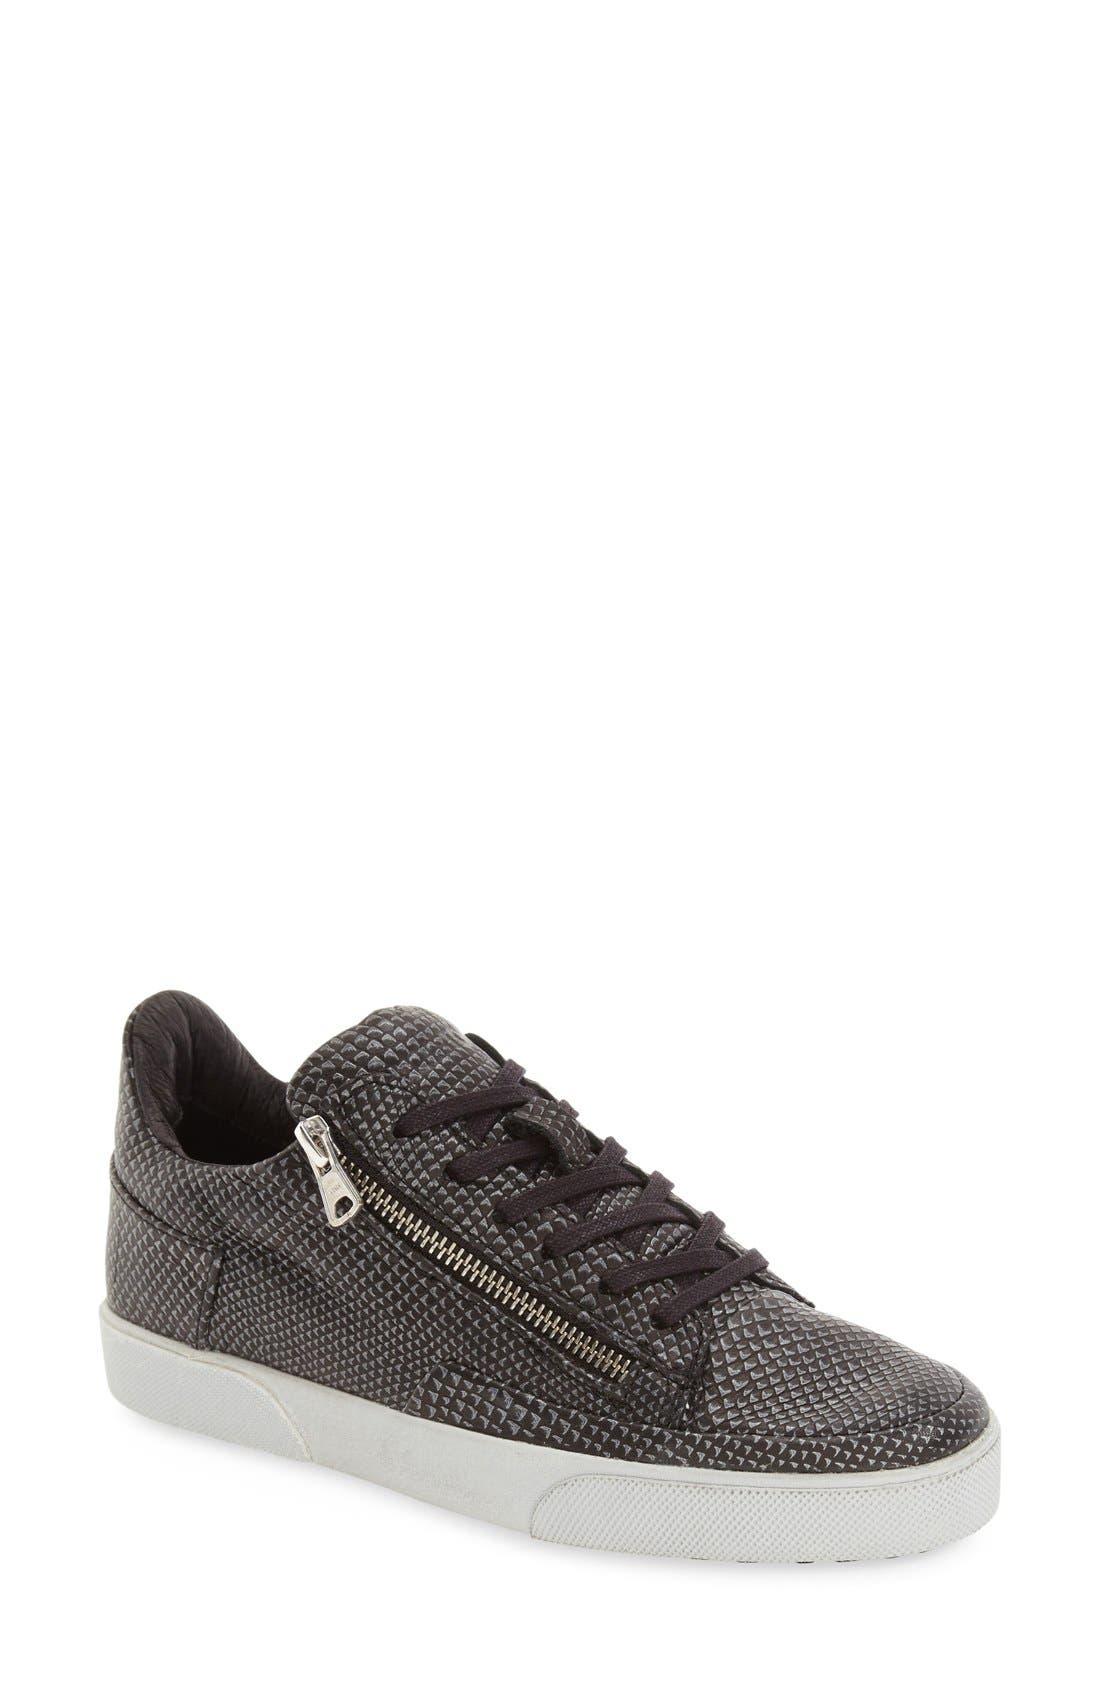 'KL51' Sneaker,                             Main thumbnail 1, color,                             BLACK METALLIC PRINTED LEATHER